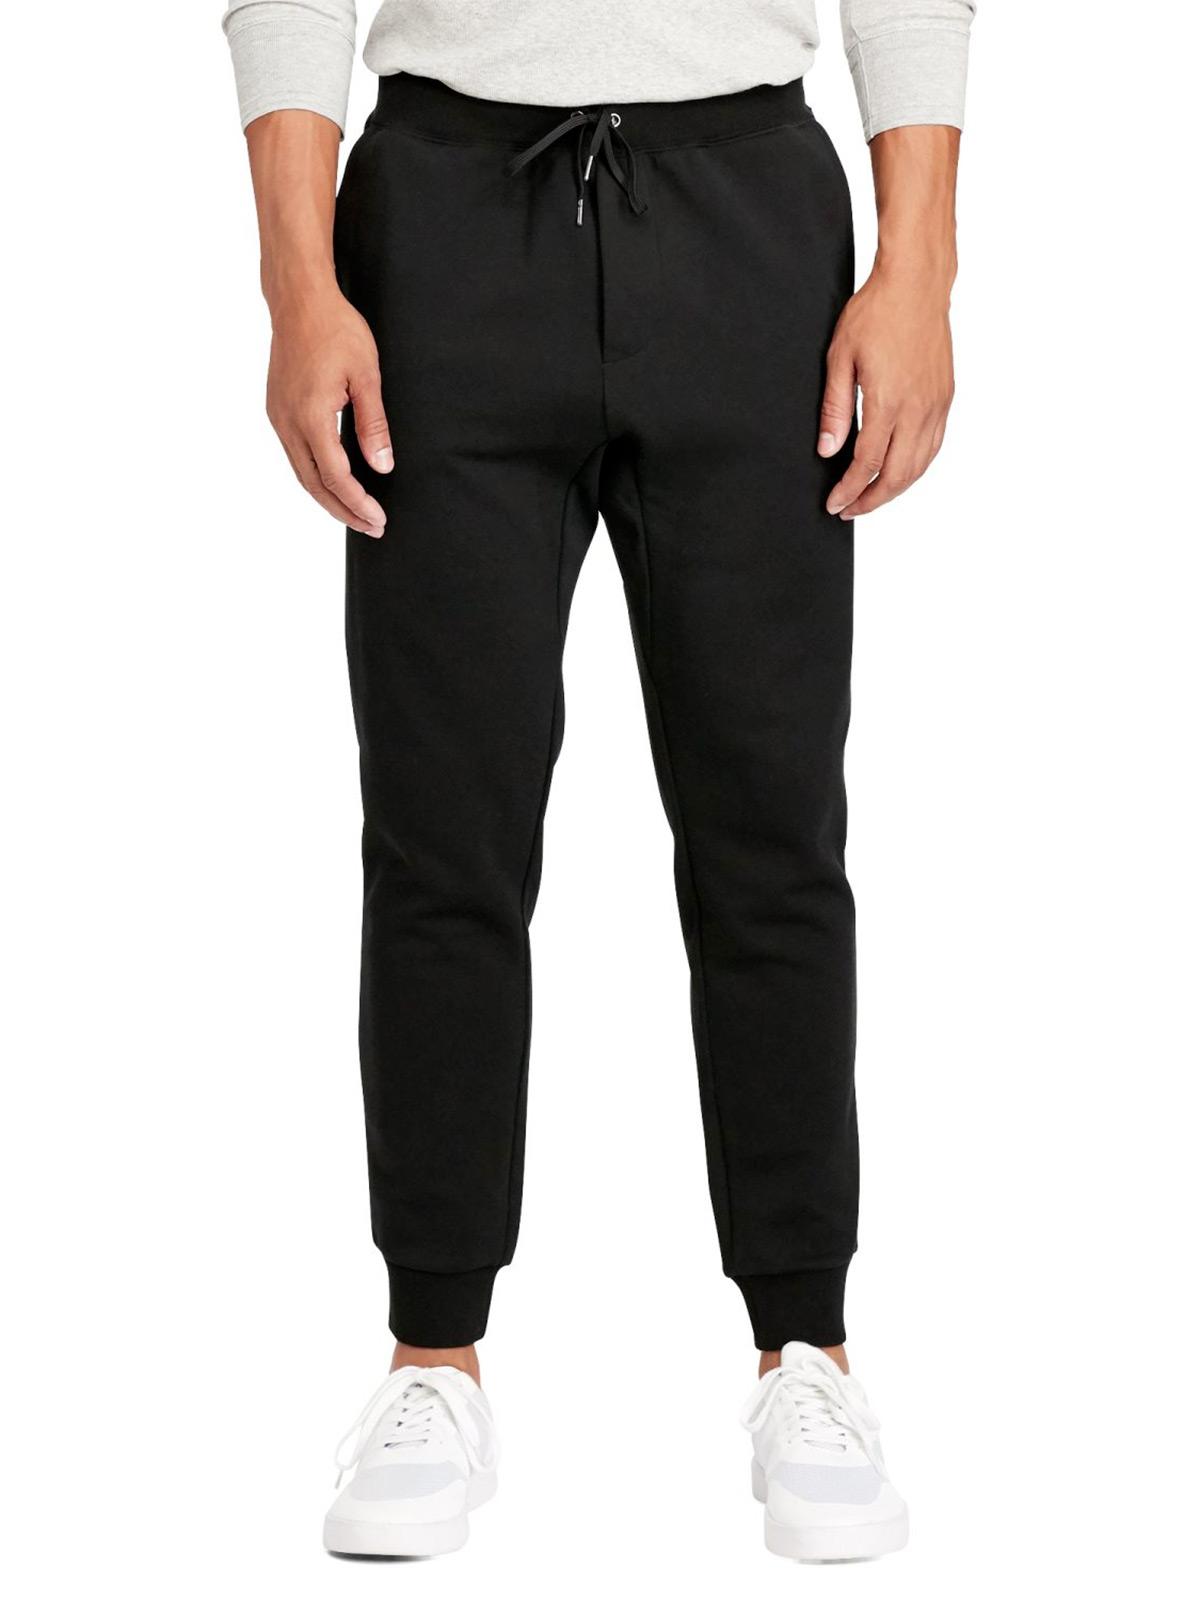 Immagine di Polo Ralph Lauren | Trousers Pantaloni